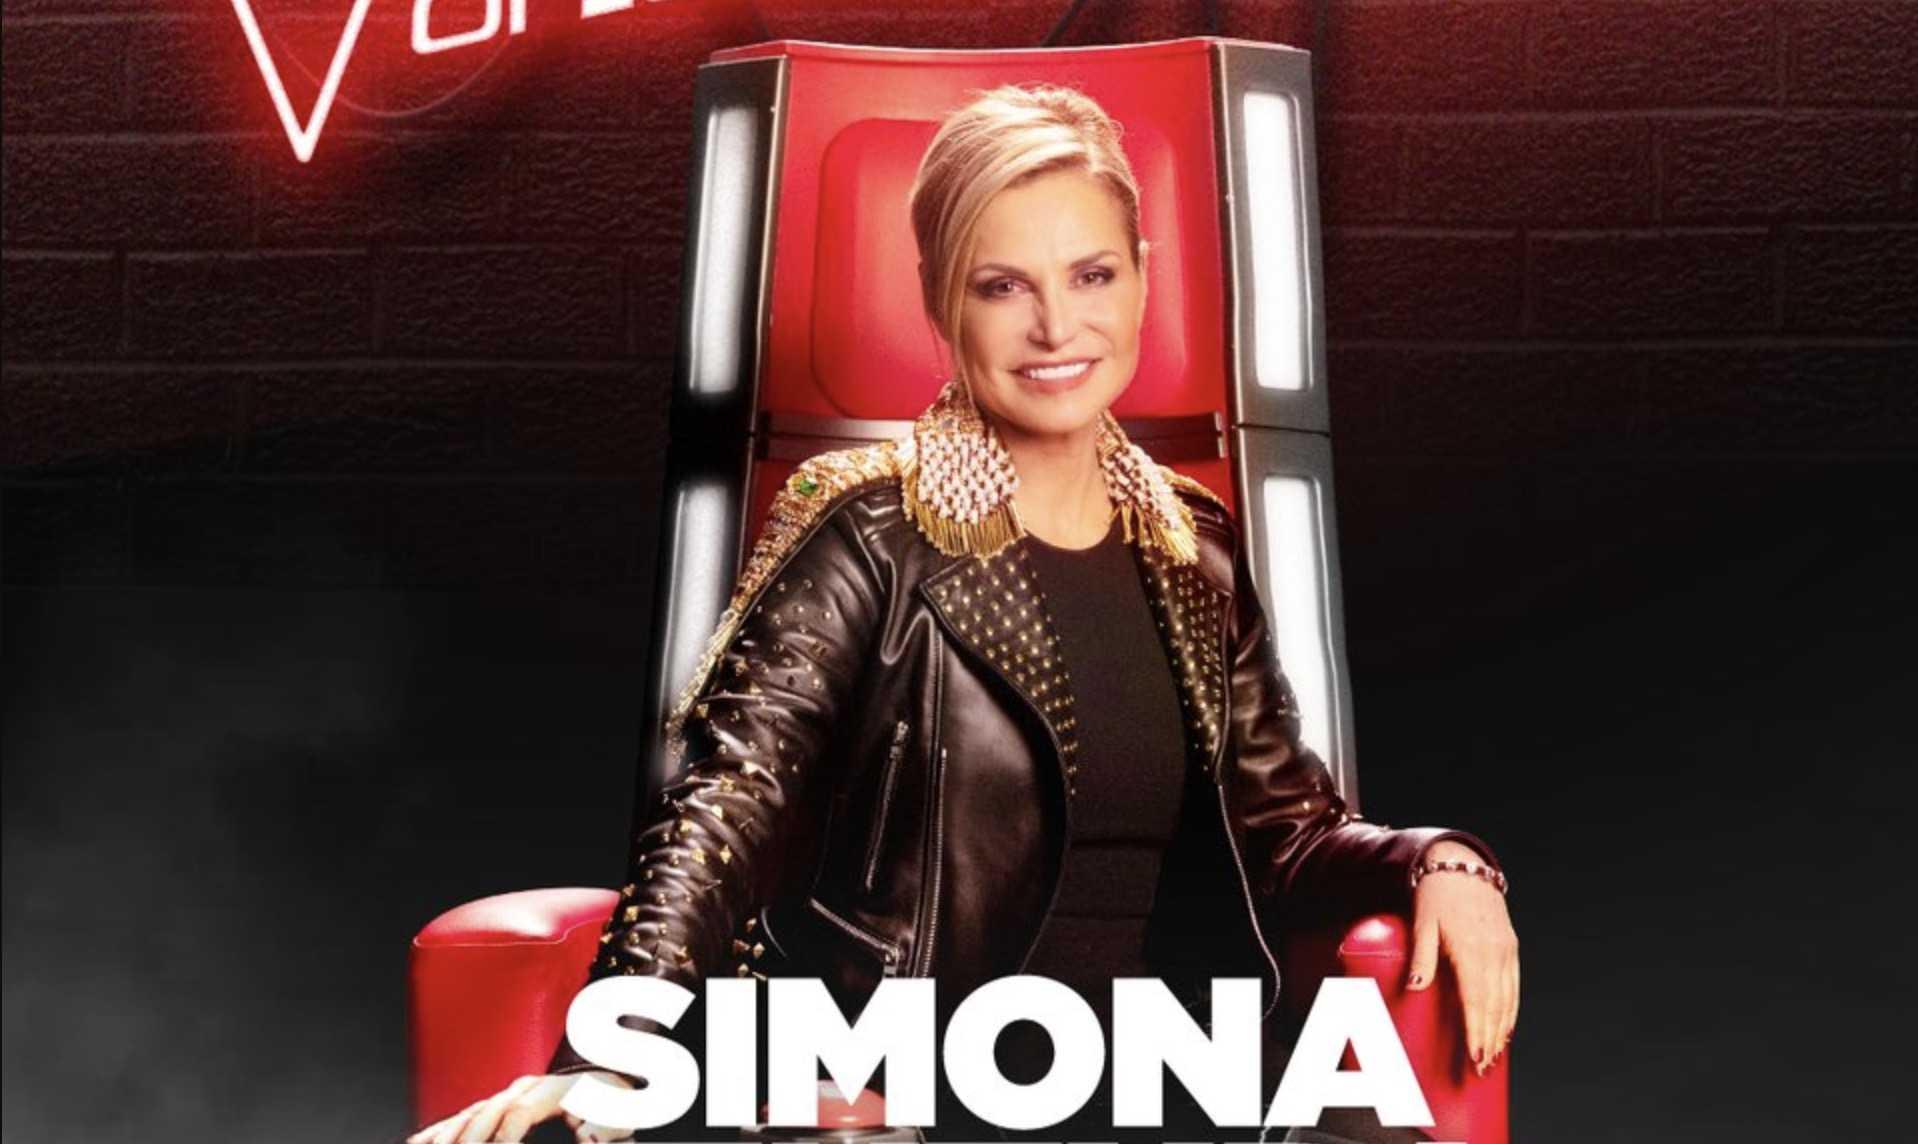 The Voice Of Italy Simona Ventura